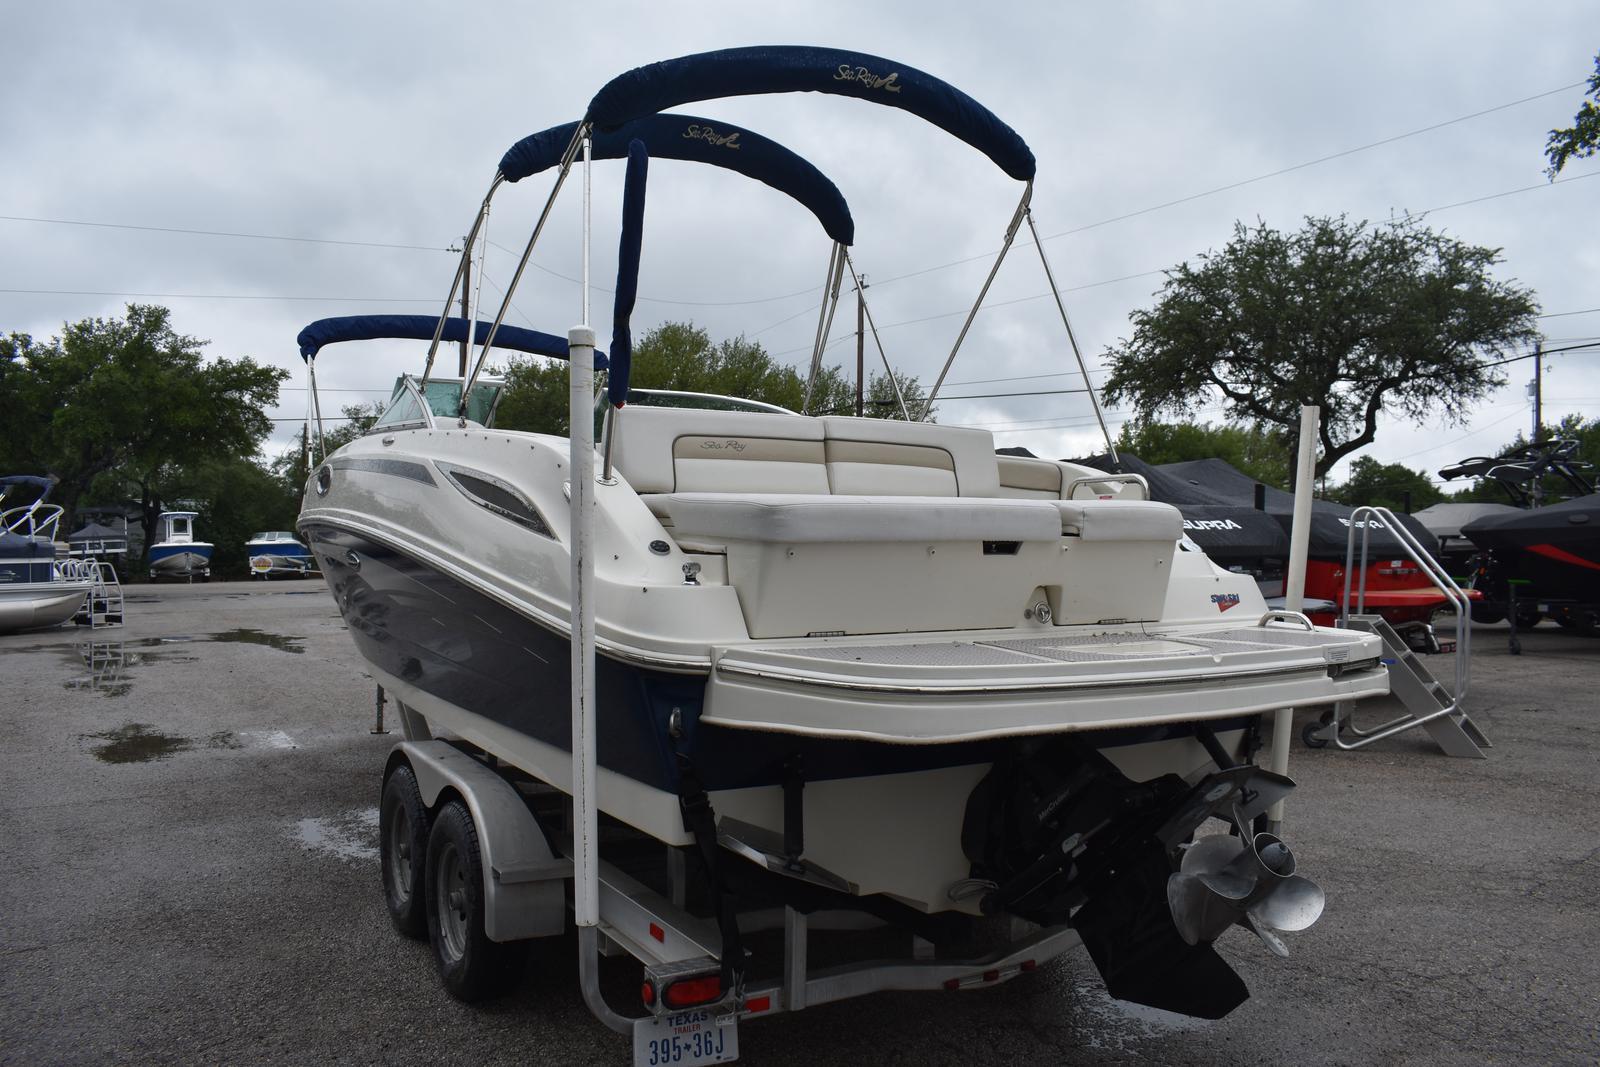 2010 Sea Ray 280 Sundeck Boat